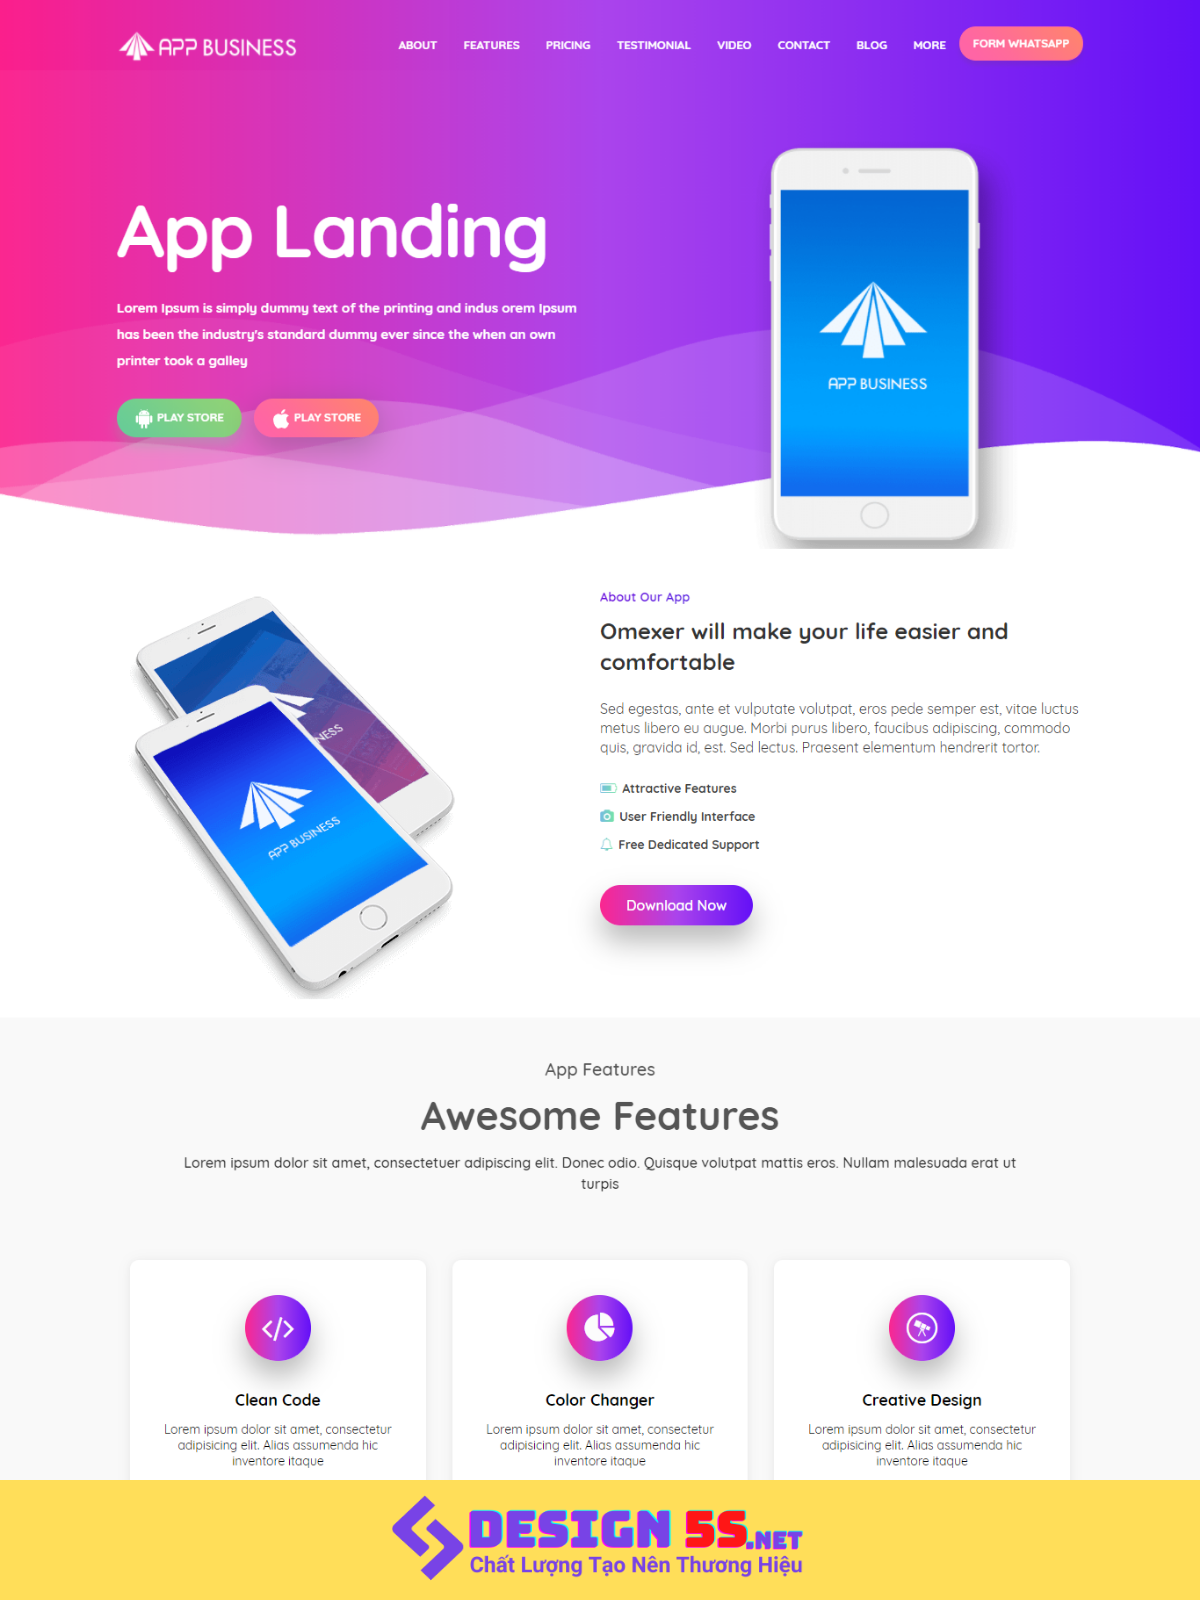 Template BLogspot landing App Business VSM68